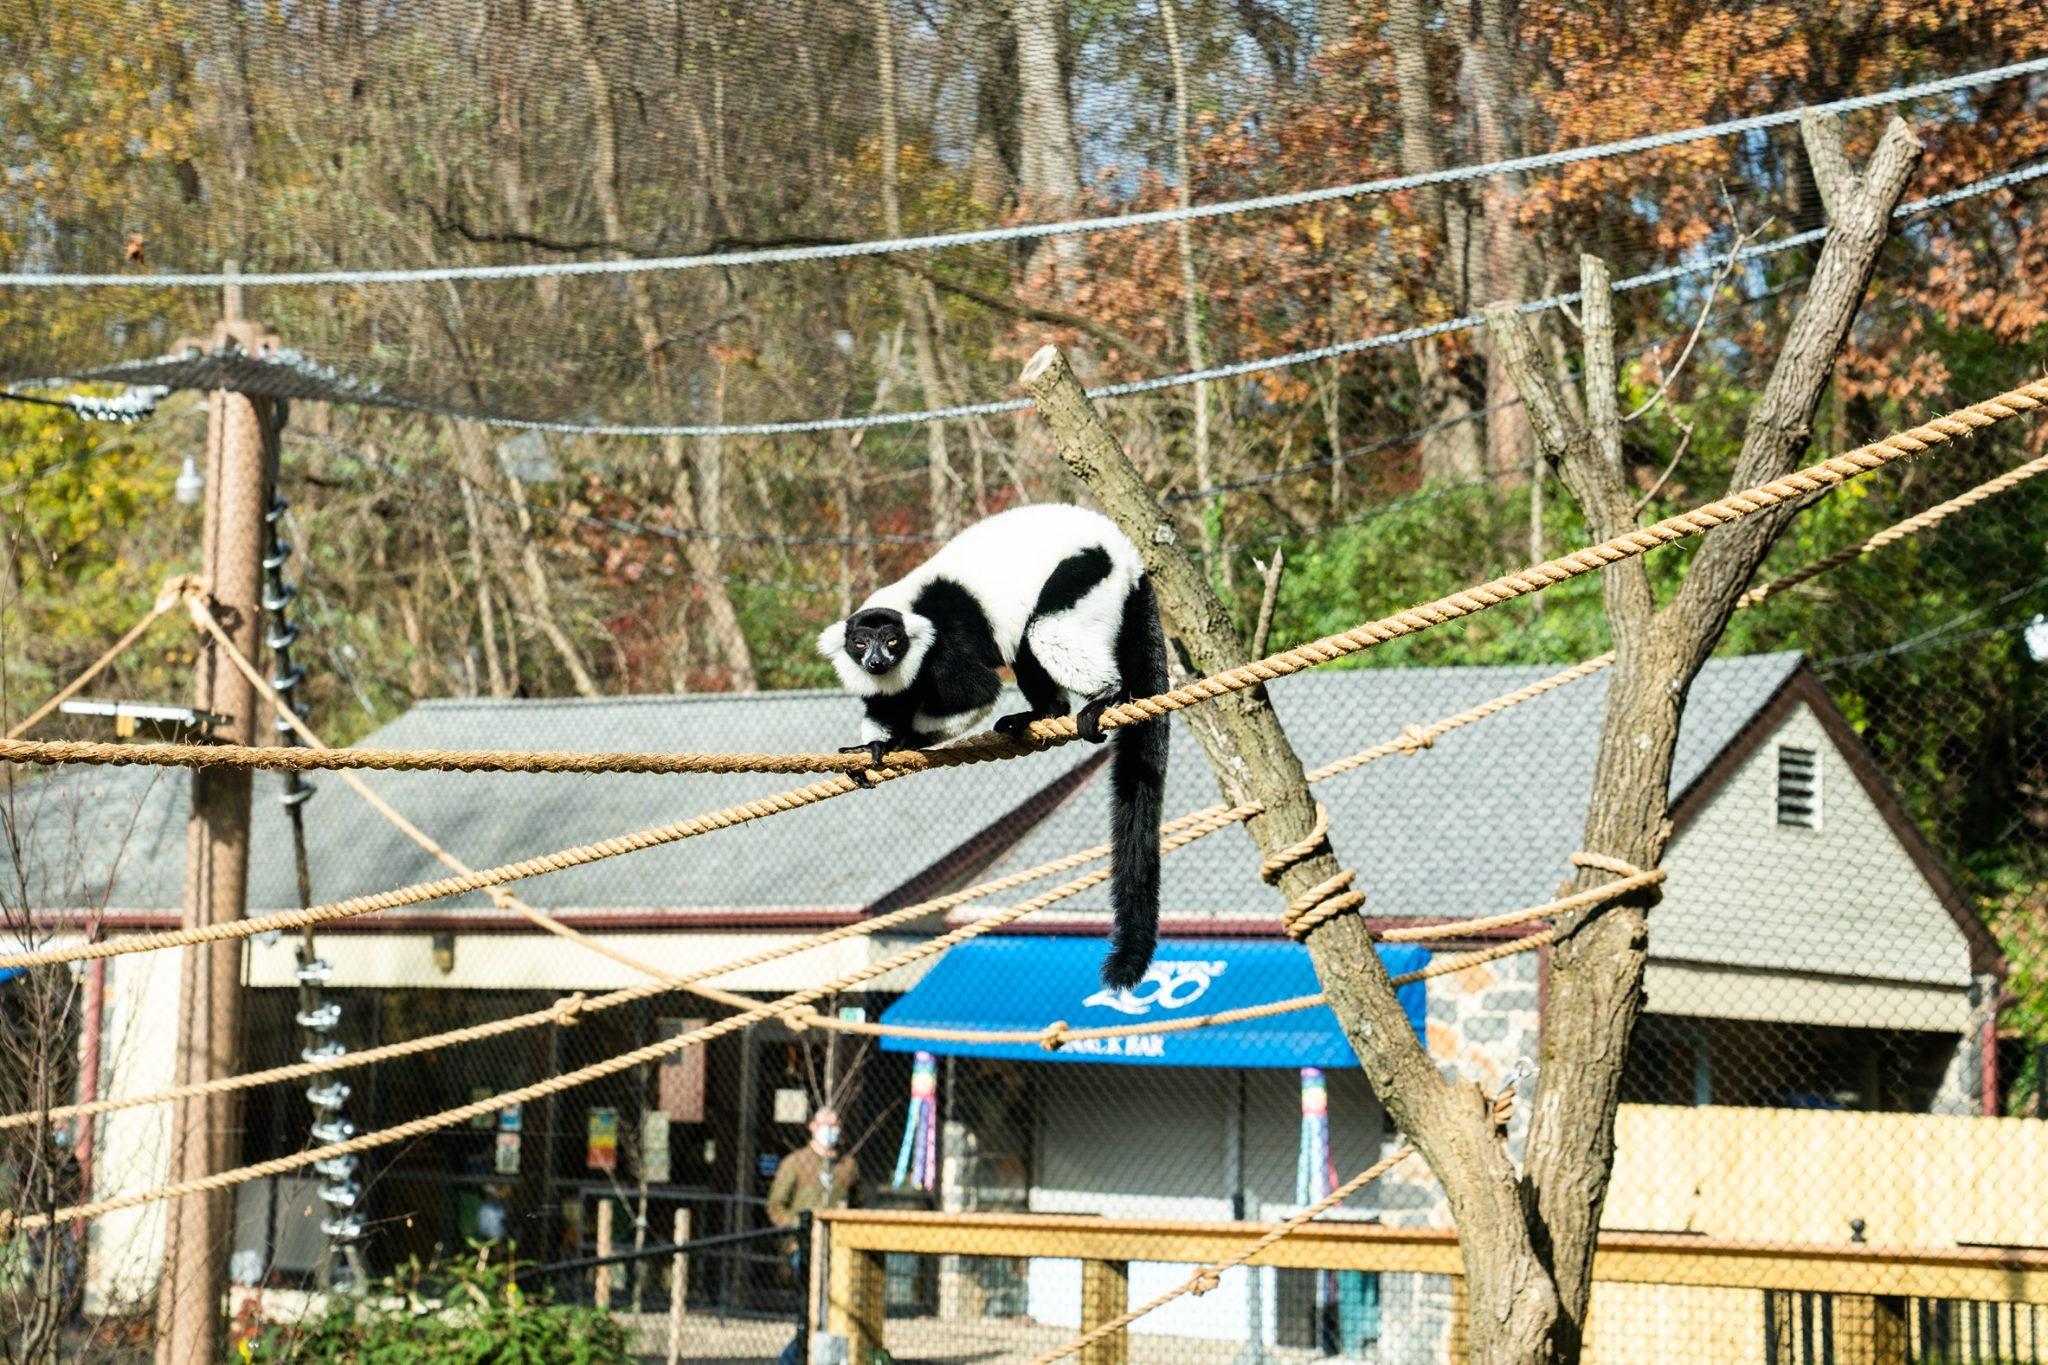 Brandywine Zoo Madagascar exhibit